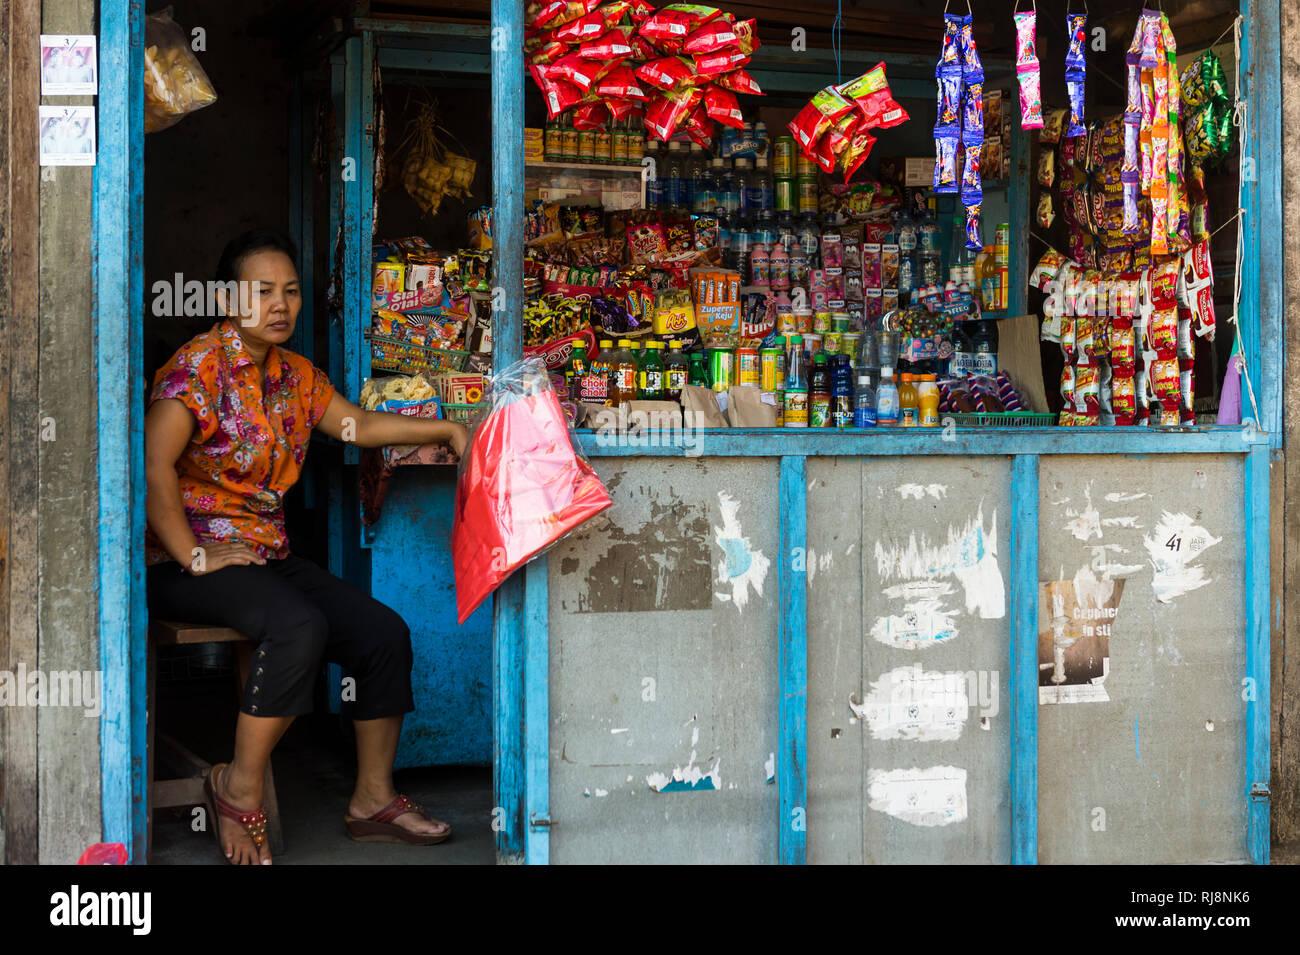 der Markt in Amlapura - Stock Image